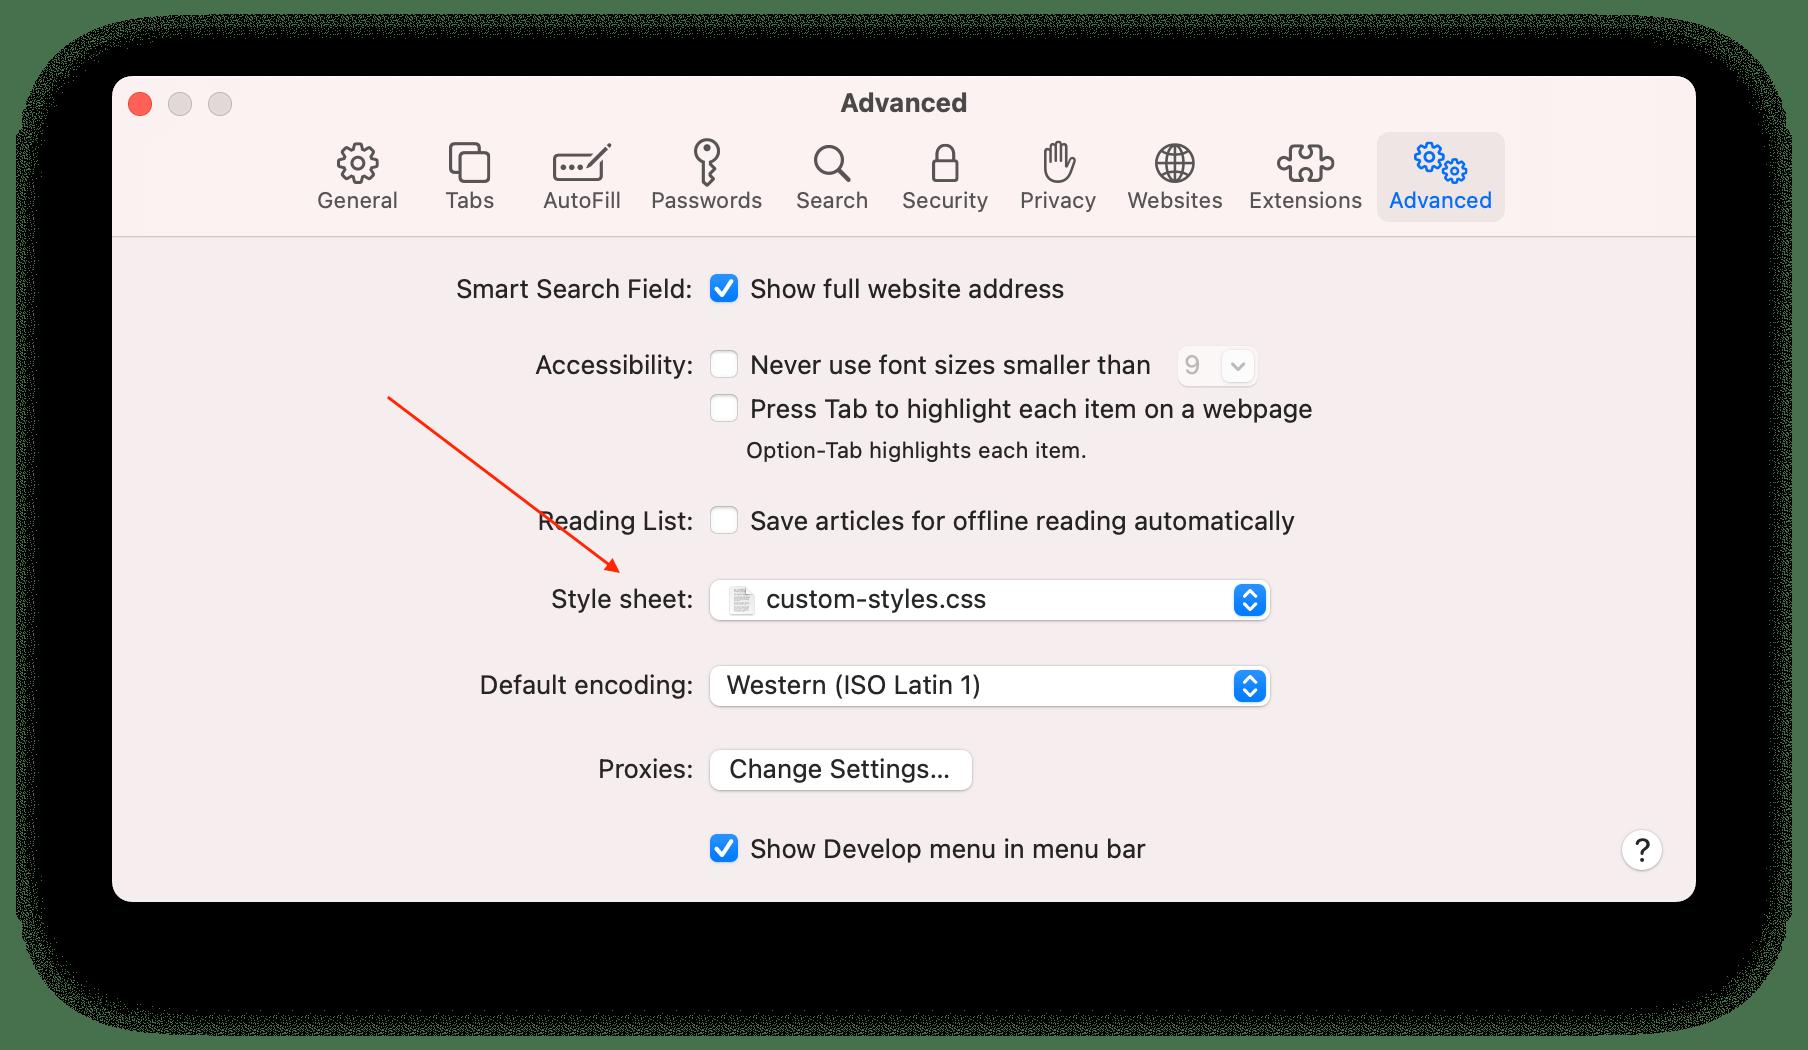 Screenshot of Safari's preferences pane where you can select a custom style sheet.